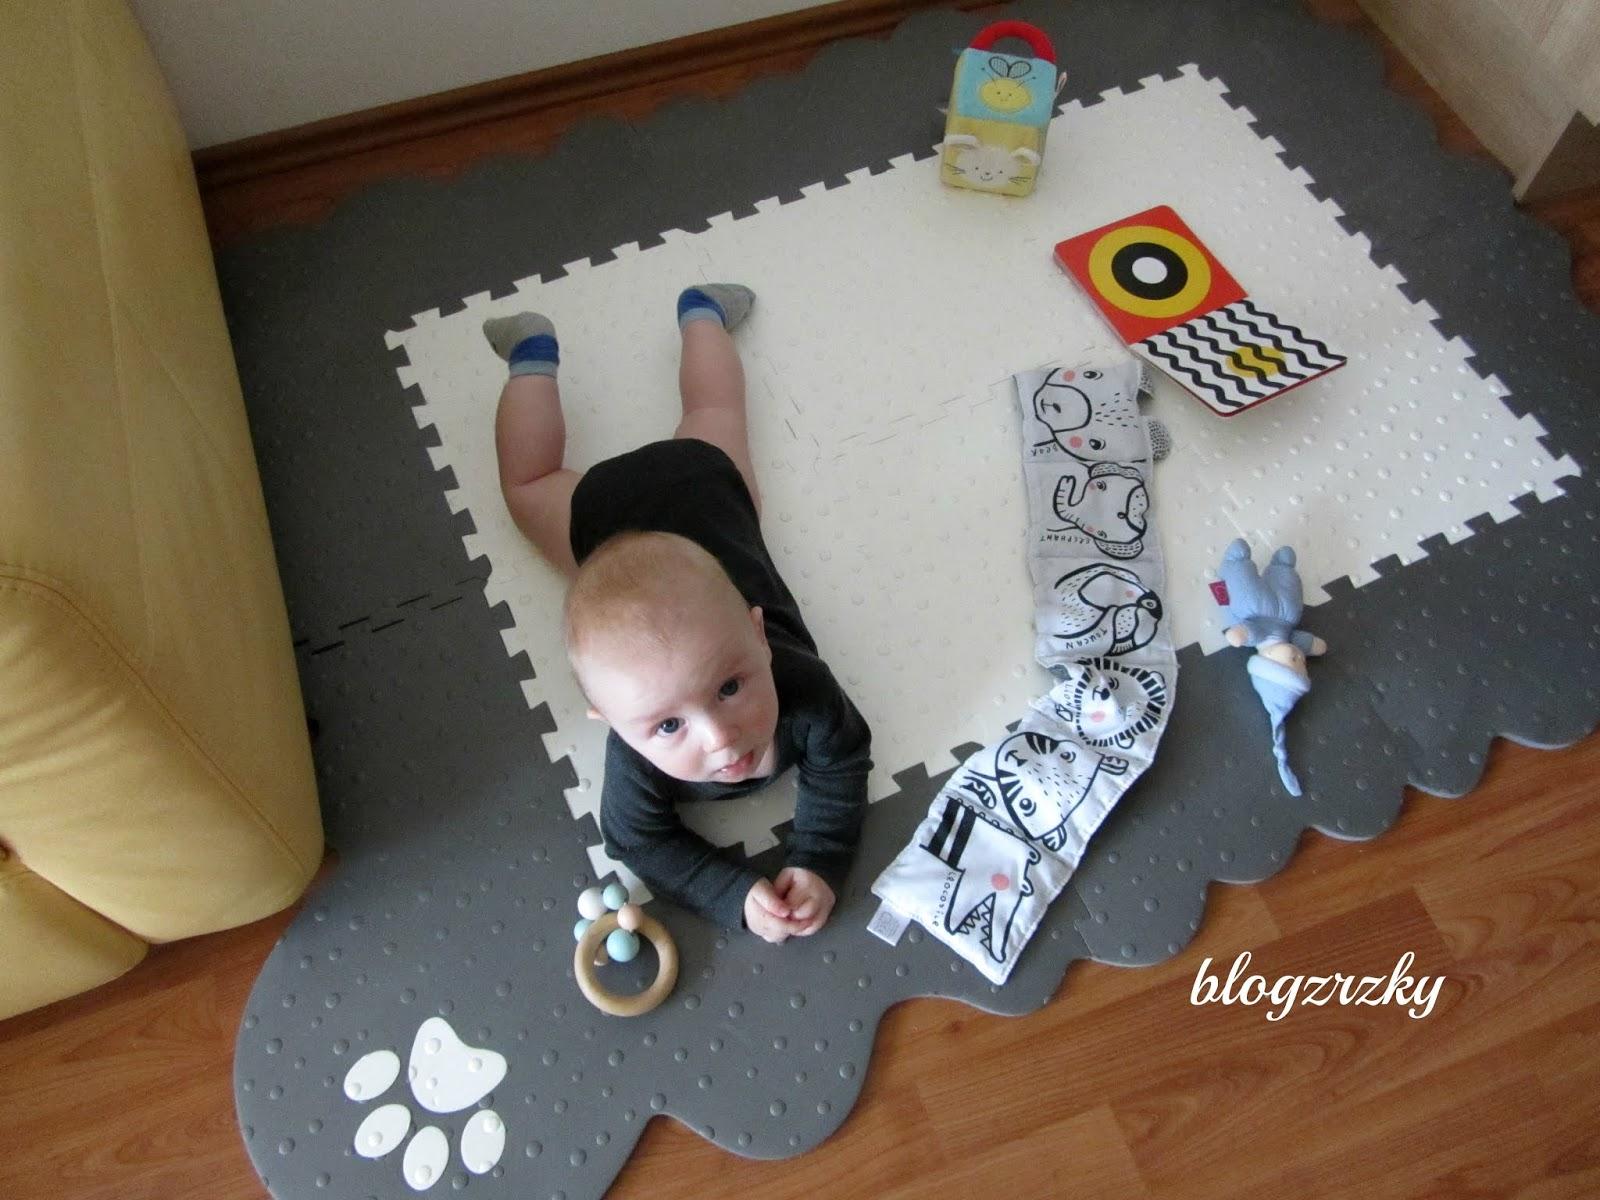 Blog Zrzky testuje puzzle podlahu Tlapka